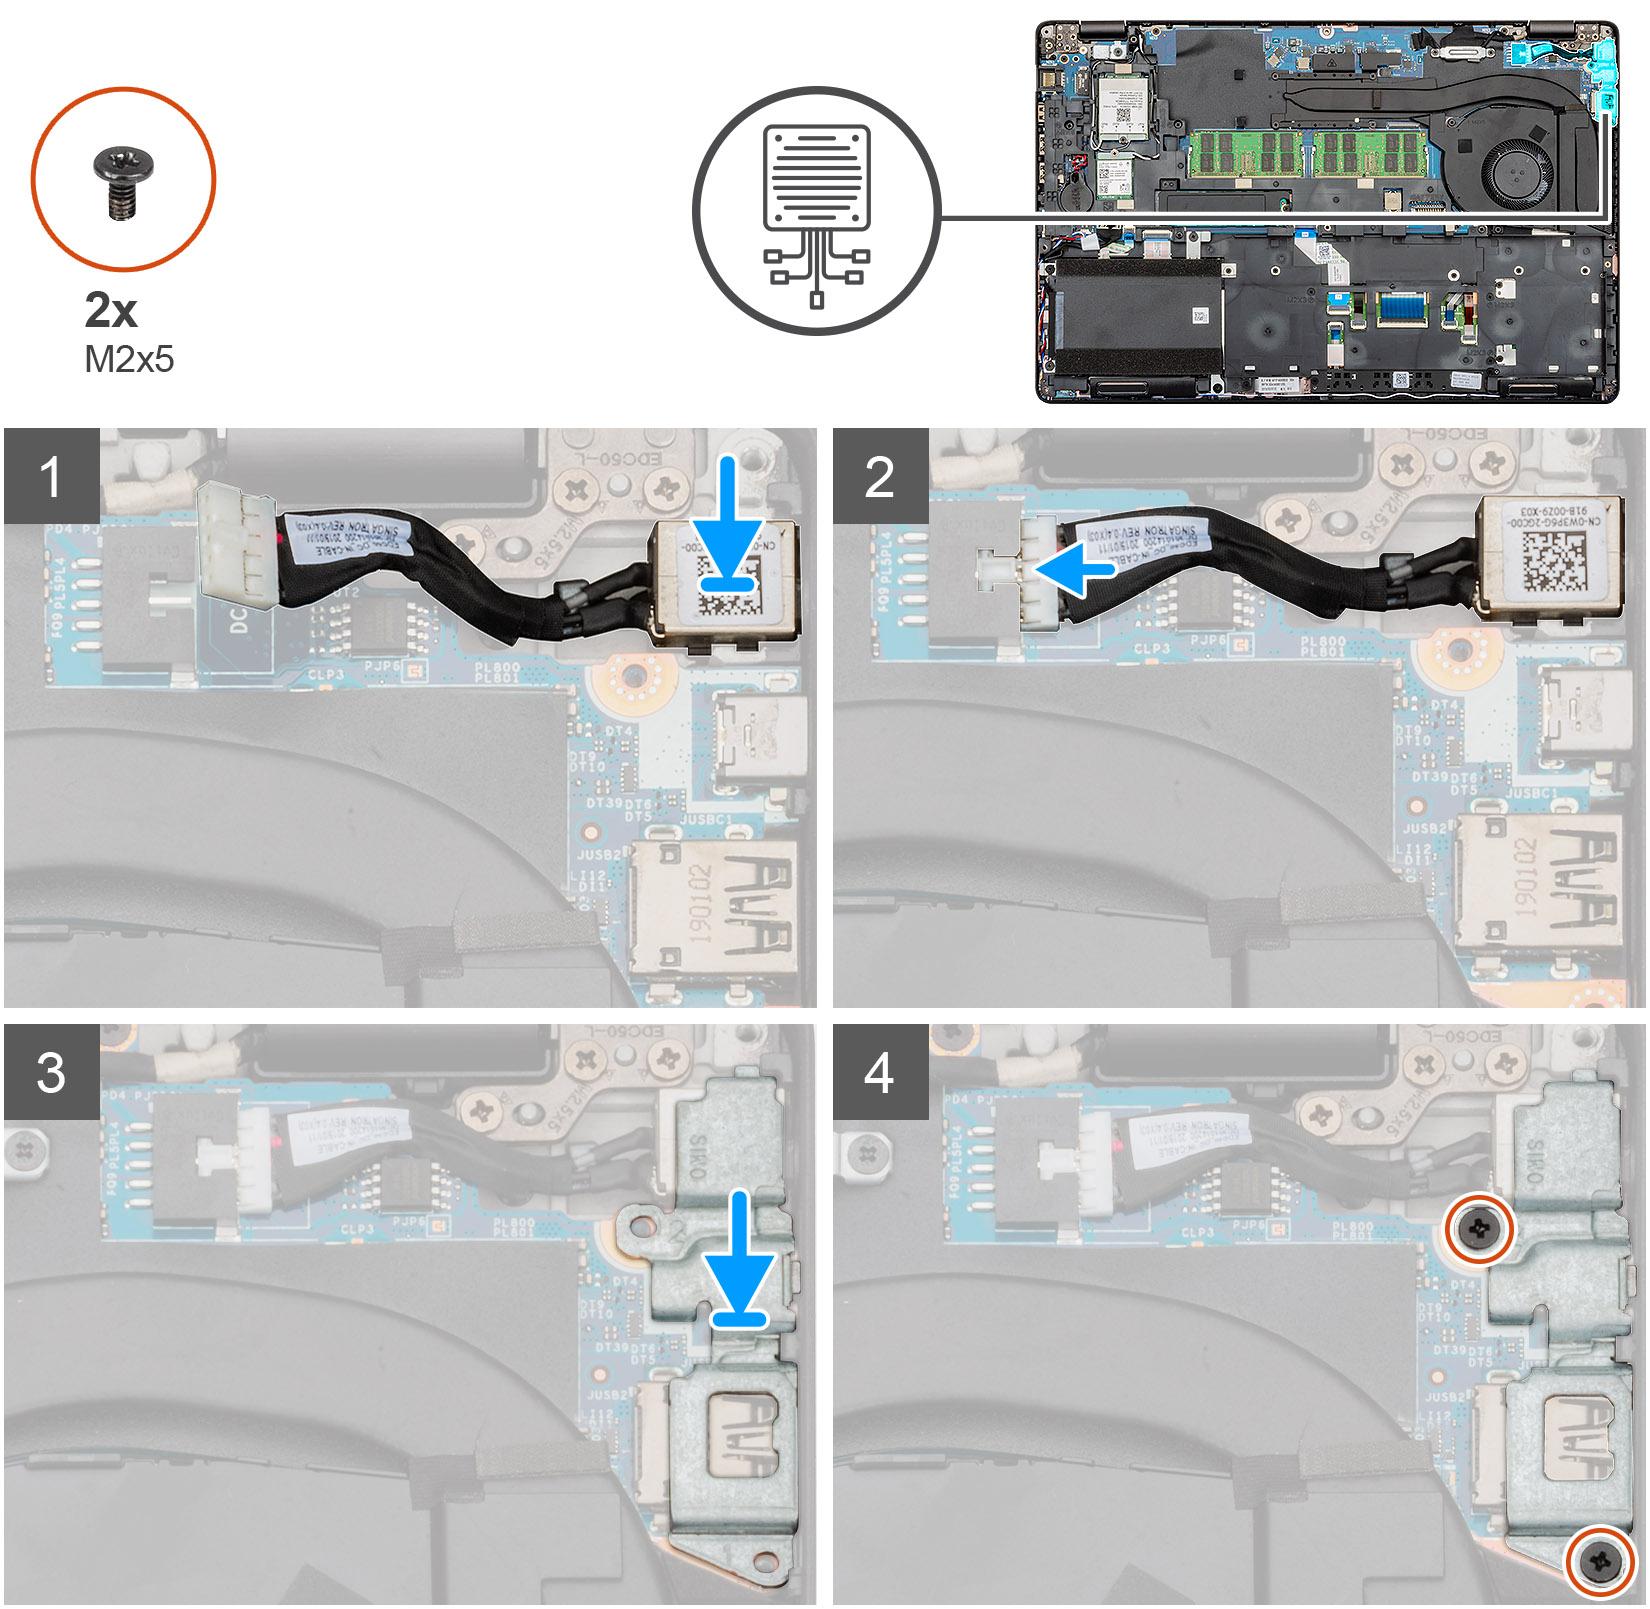 Installing the DC-in UMA